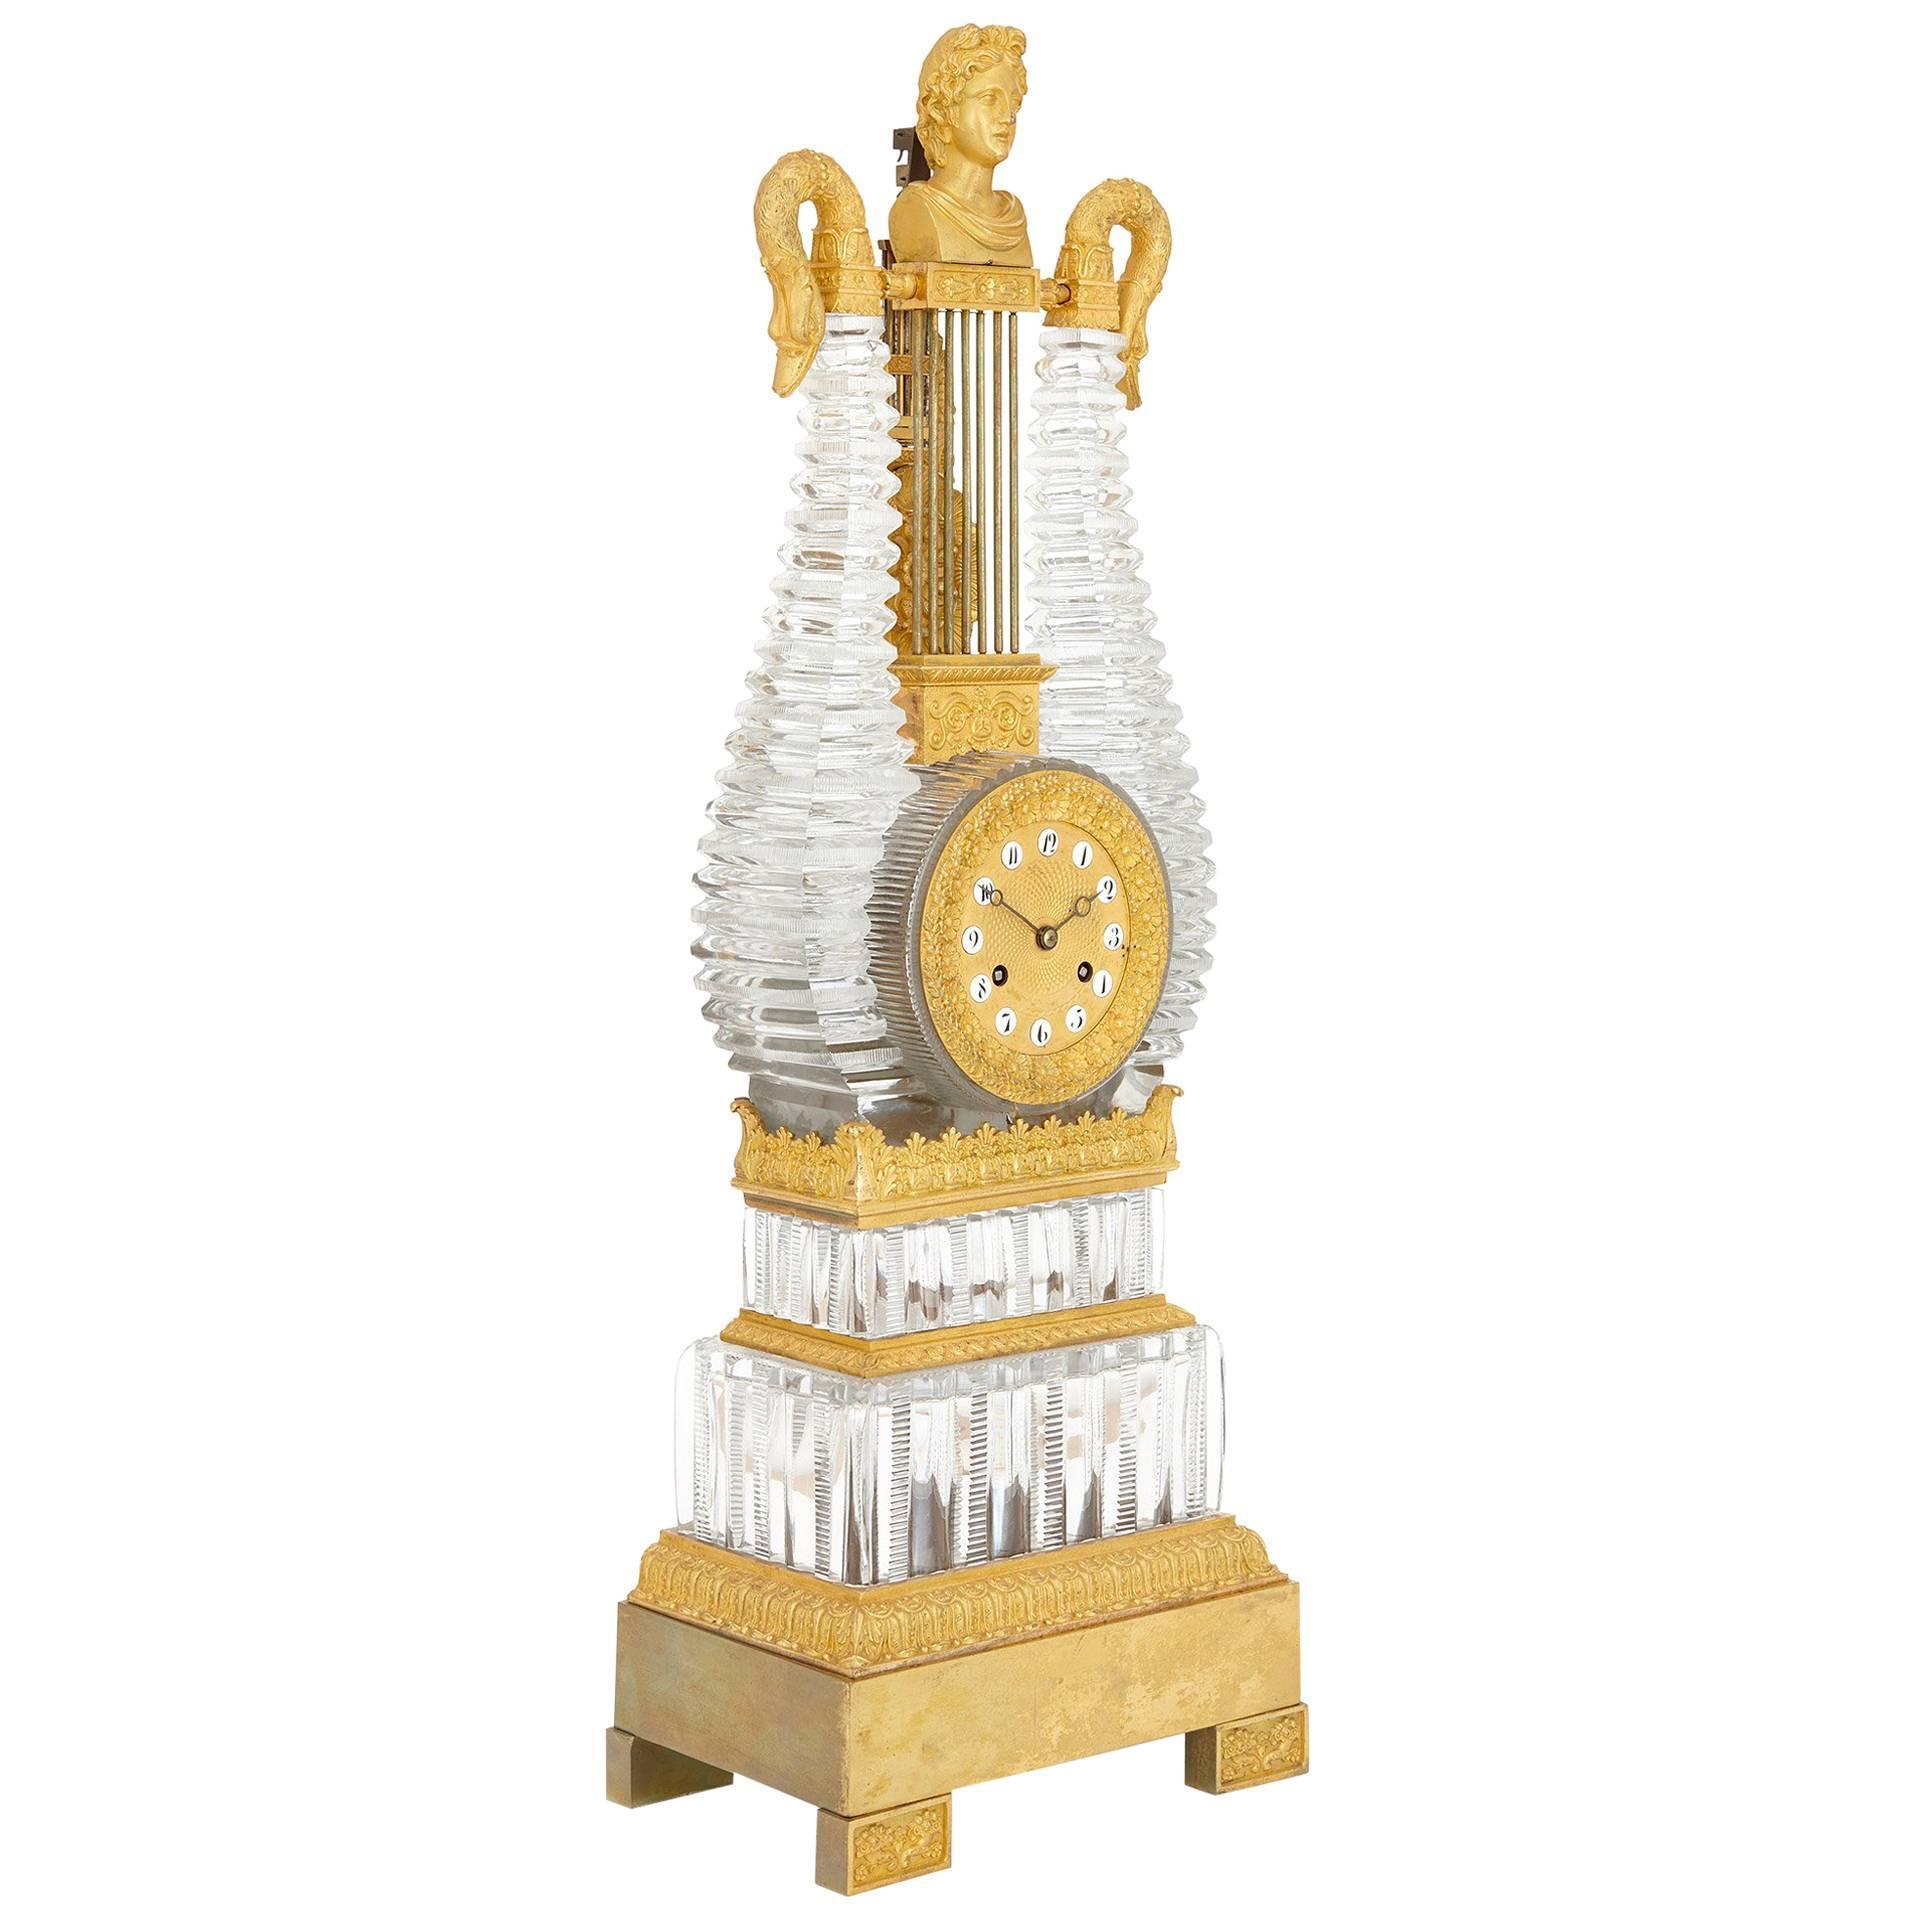 French Restauration Period Gilt Bronze and Cut-Glass Mantel Clock